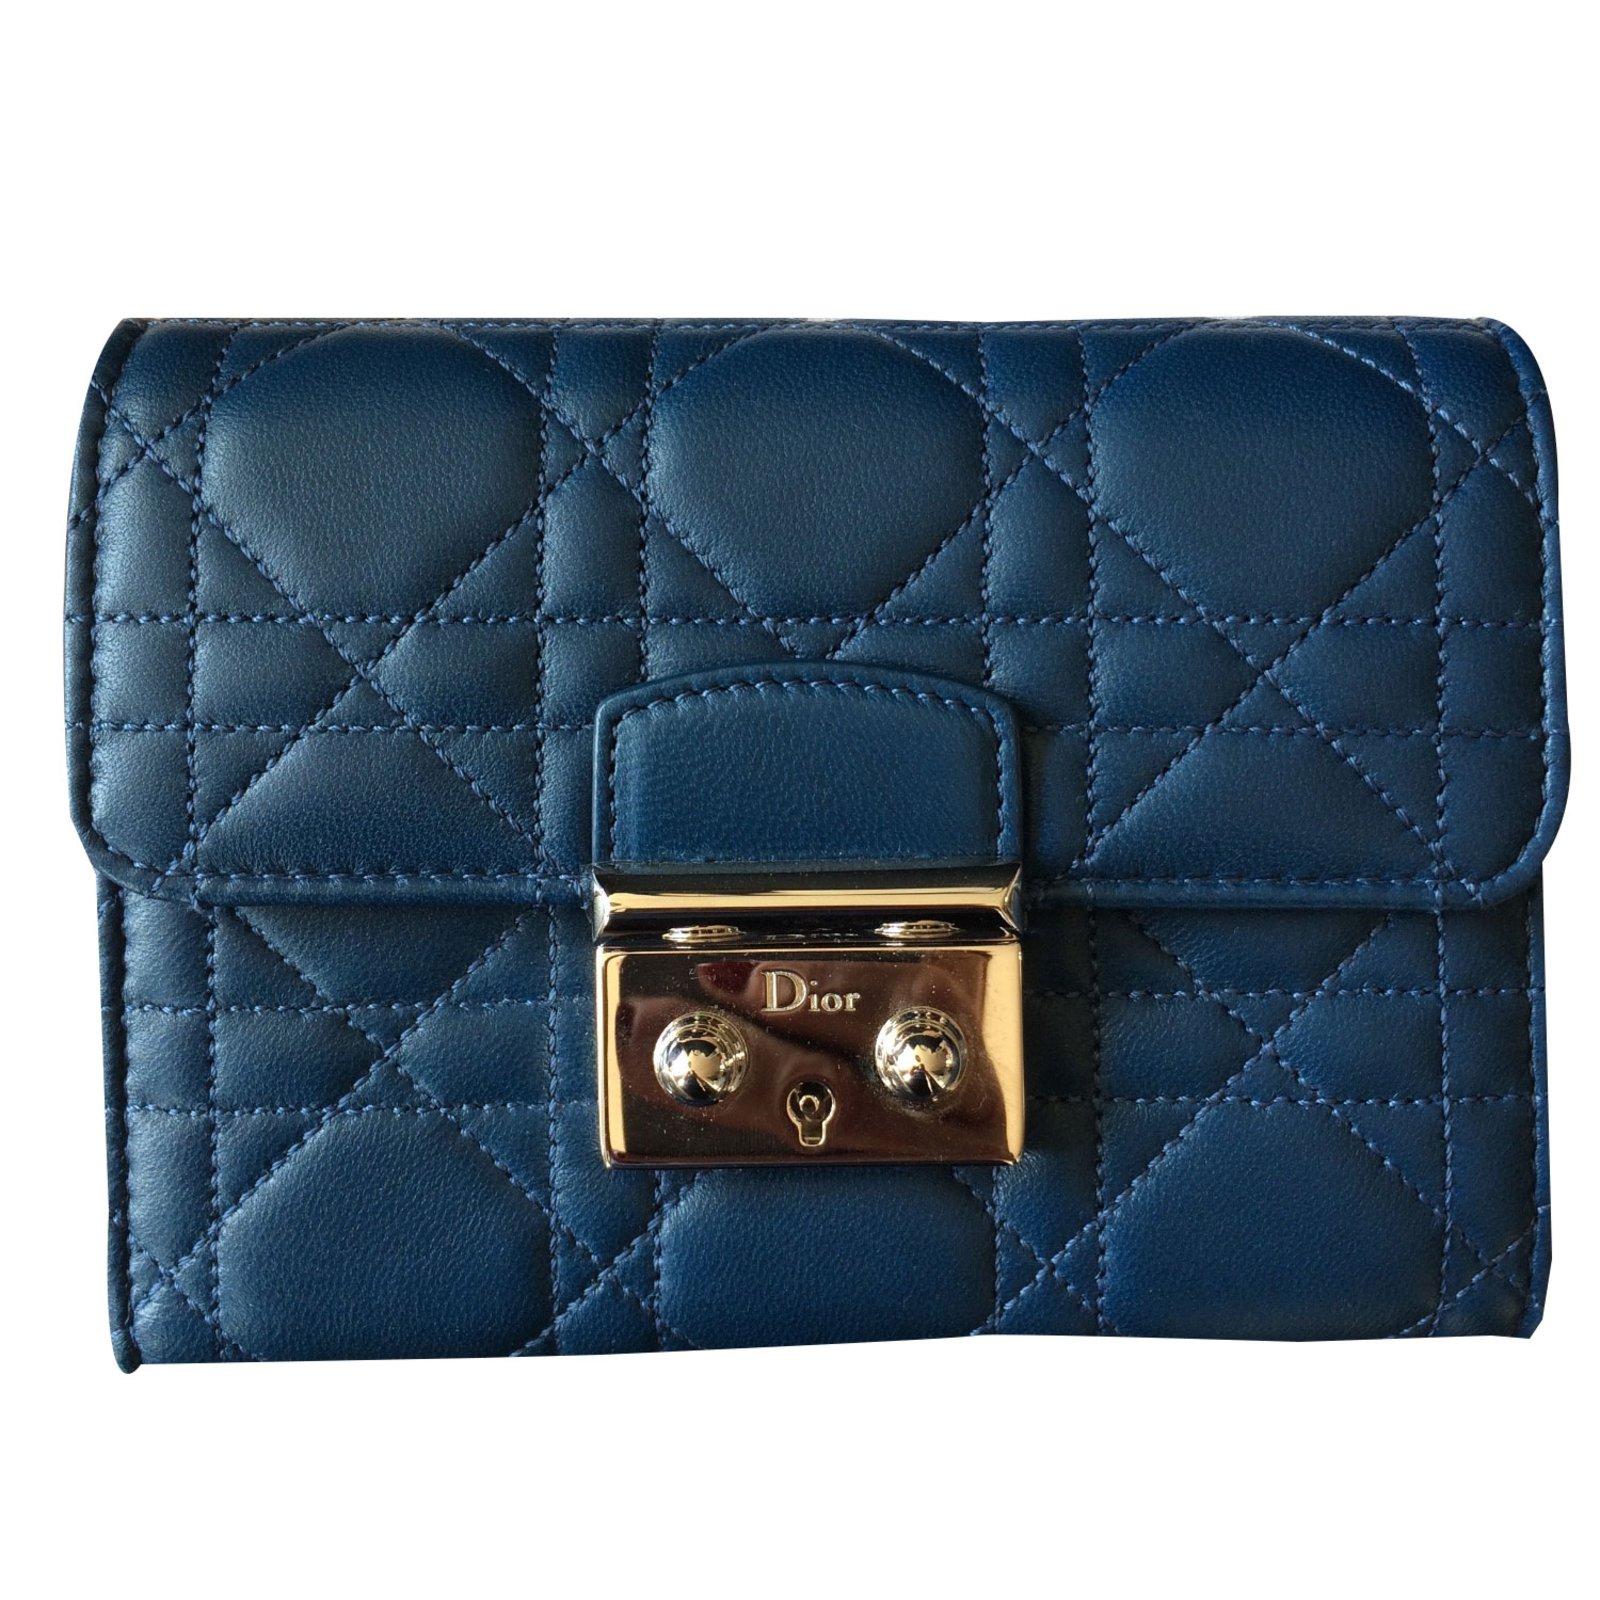 4a818205ddbd Dior Wallet Online. Christian Dior Wallet Wallets Leather Blue ref.38048 - Joli  Closet